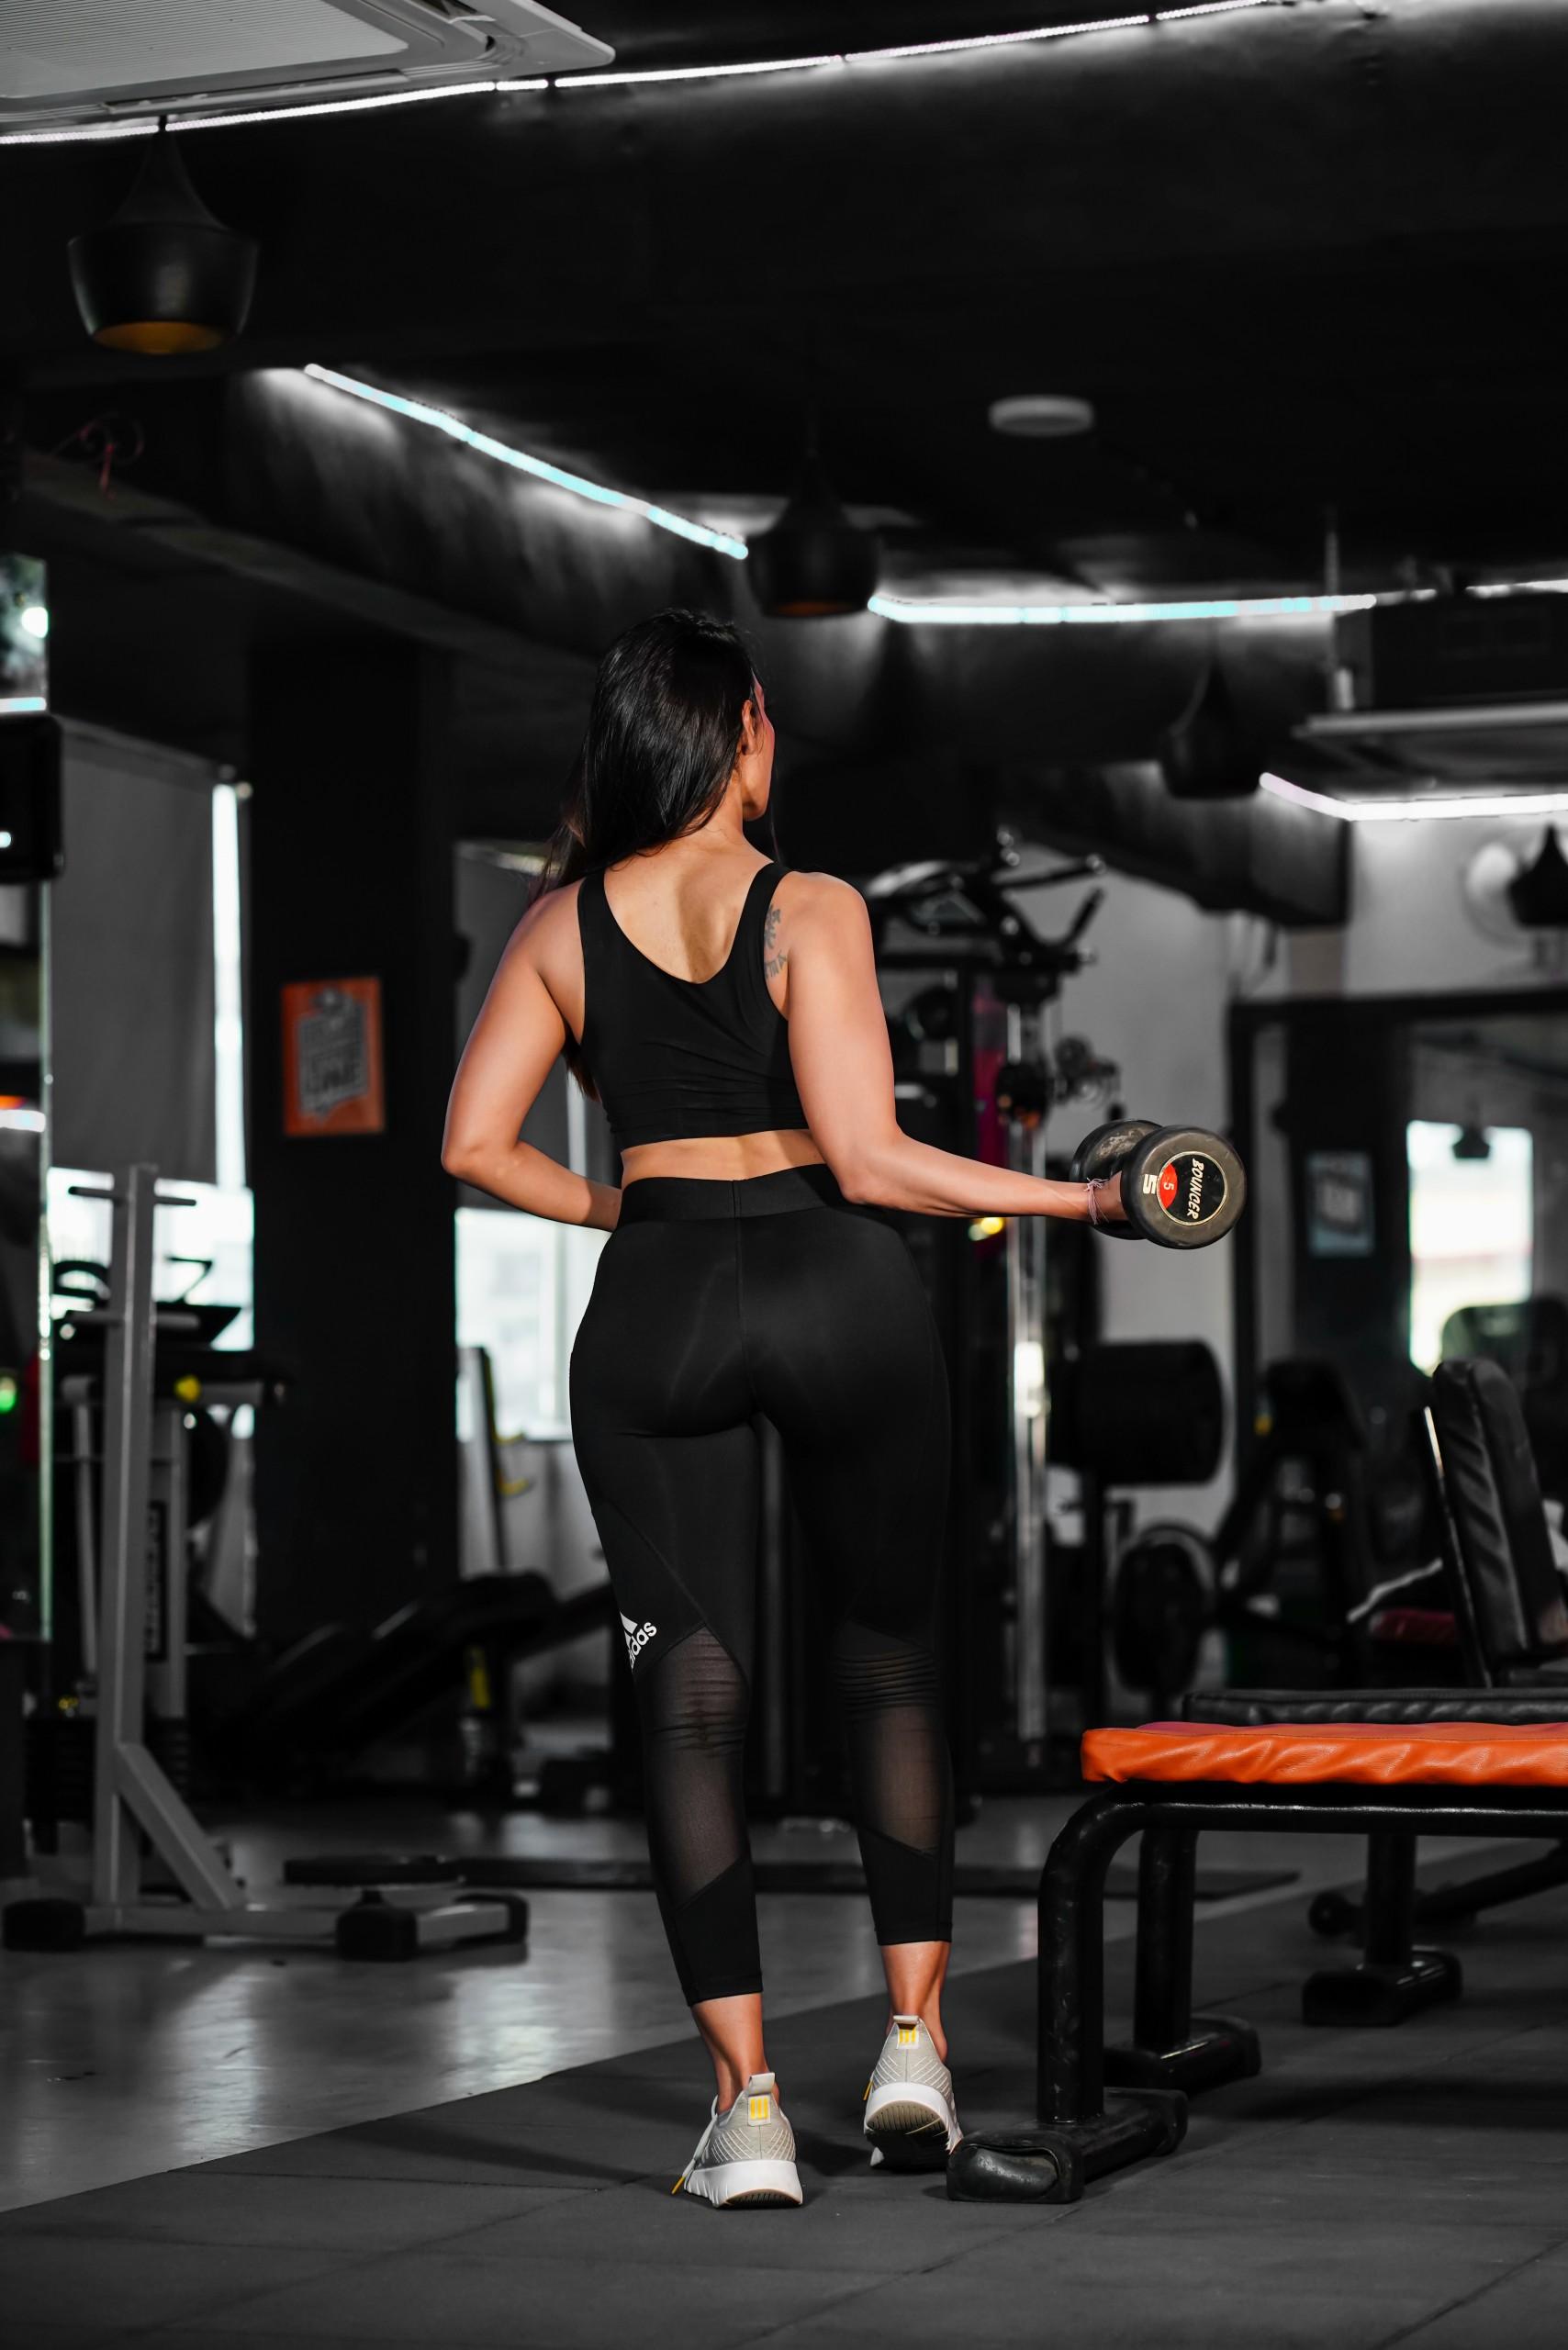 Fitness female model in gym